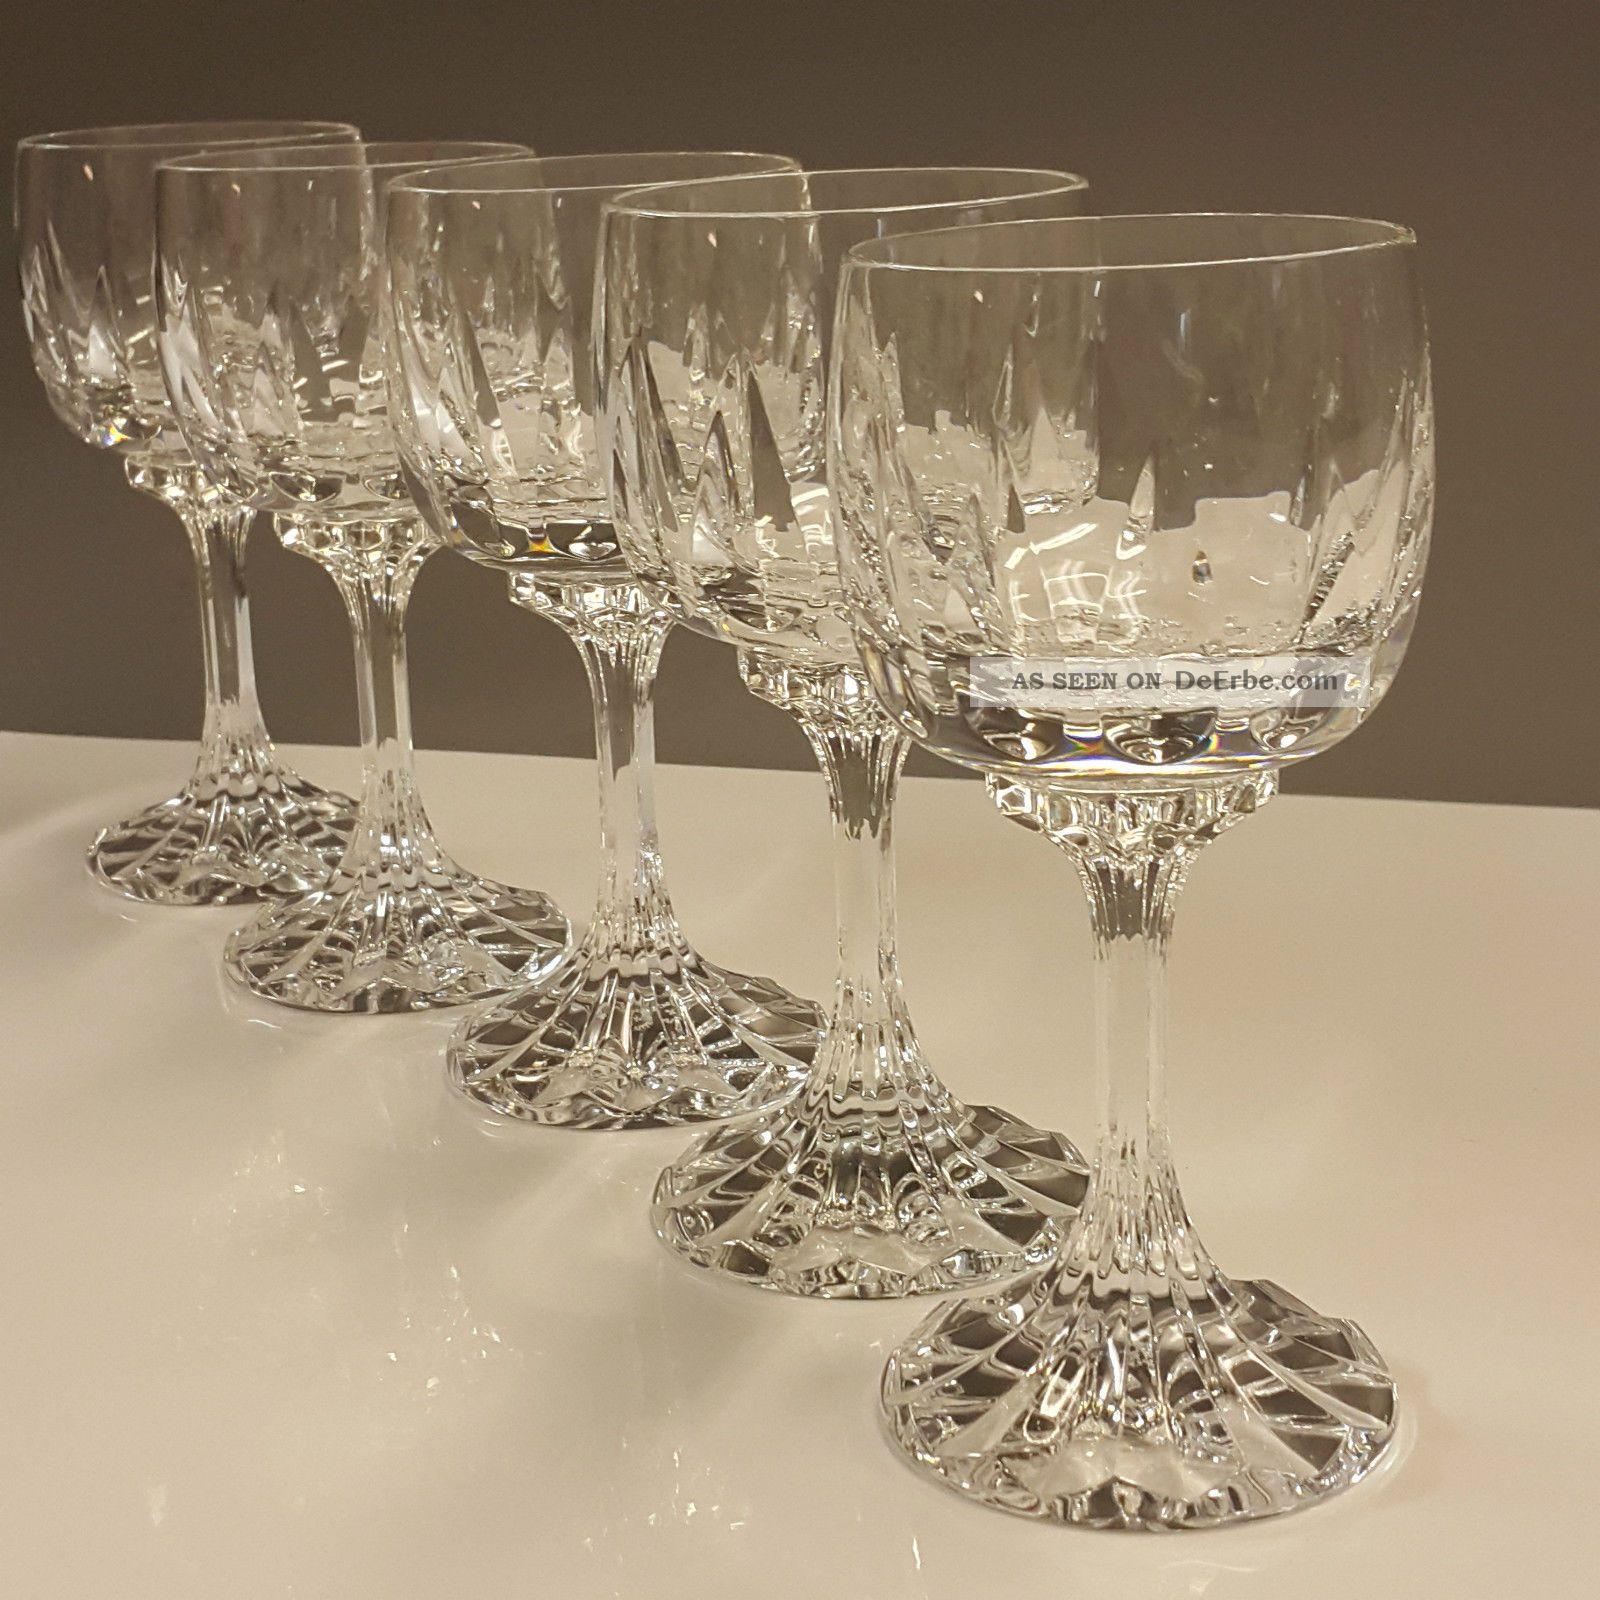 5 Villeroy & Boch Bleikristall Weißweingläser Weinglas Arabelle Neuw.  14,  8cm Kristall Bild